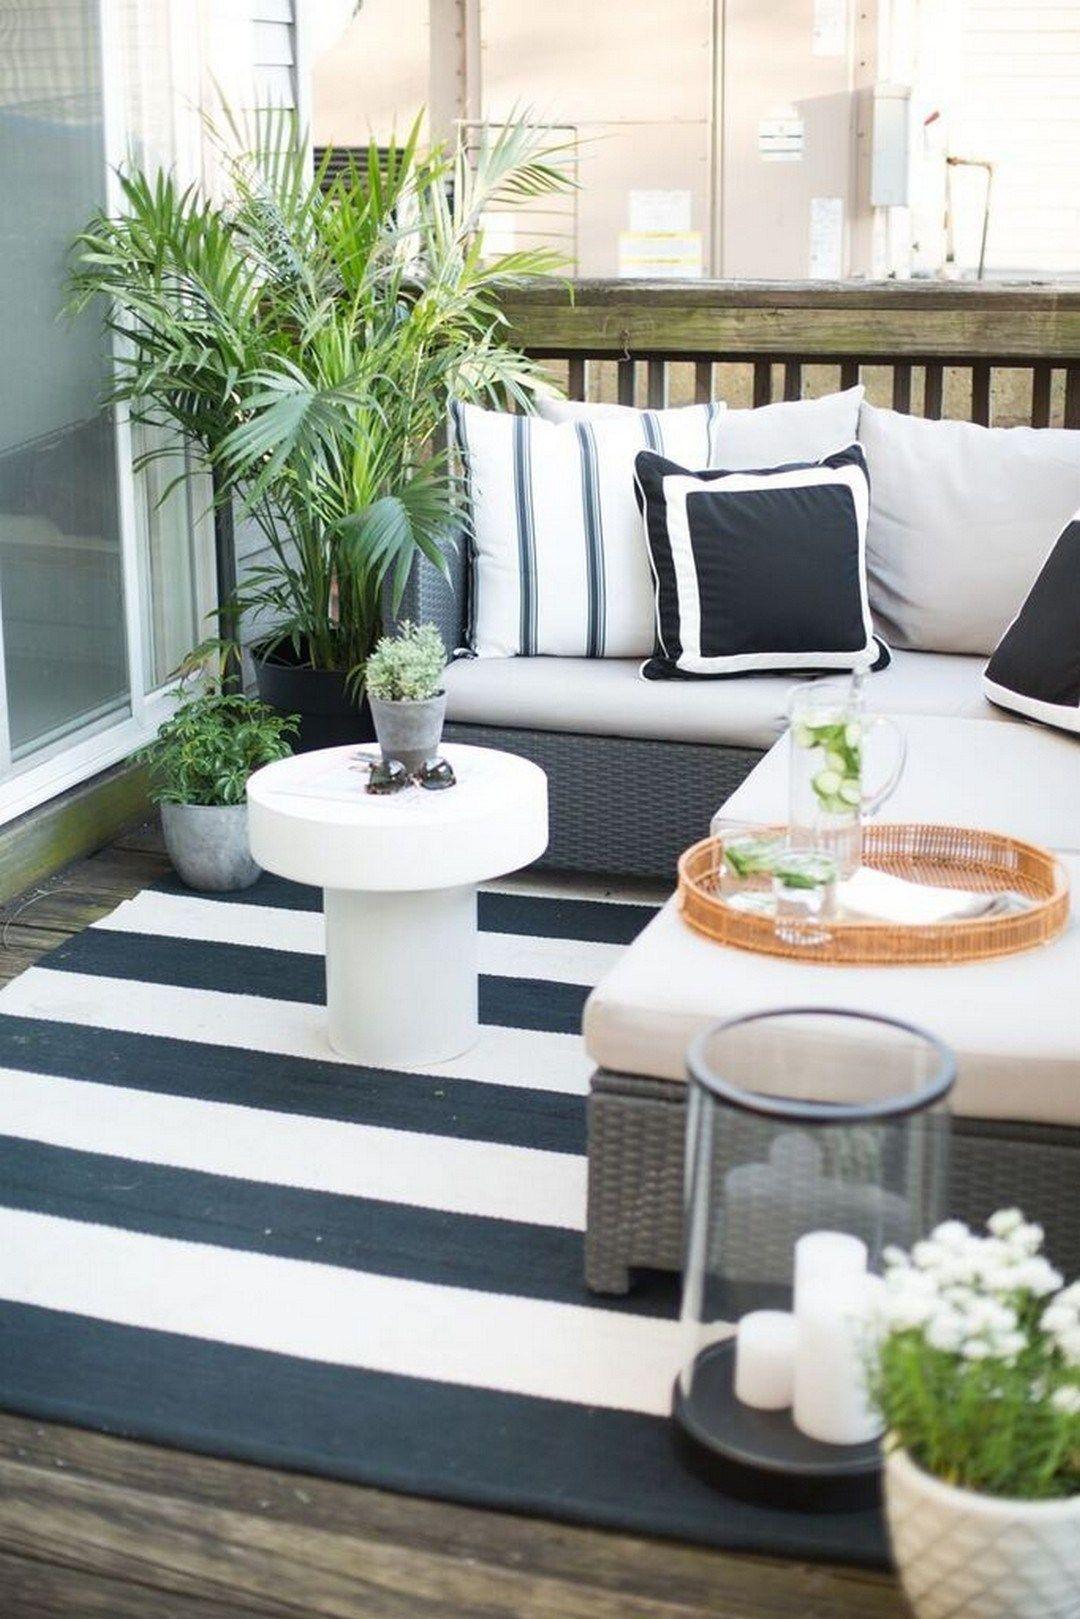 99 Diy Small Apartement Decorating Ideas 68